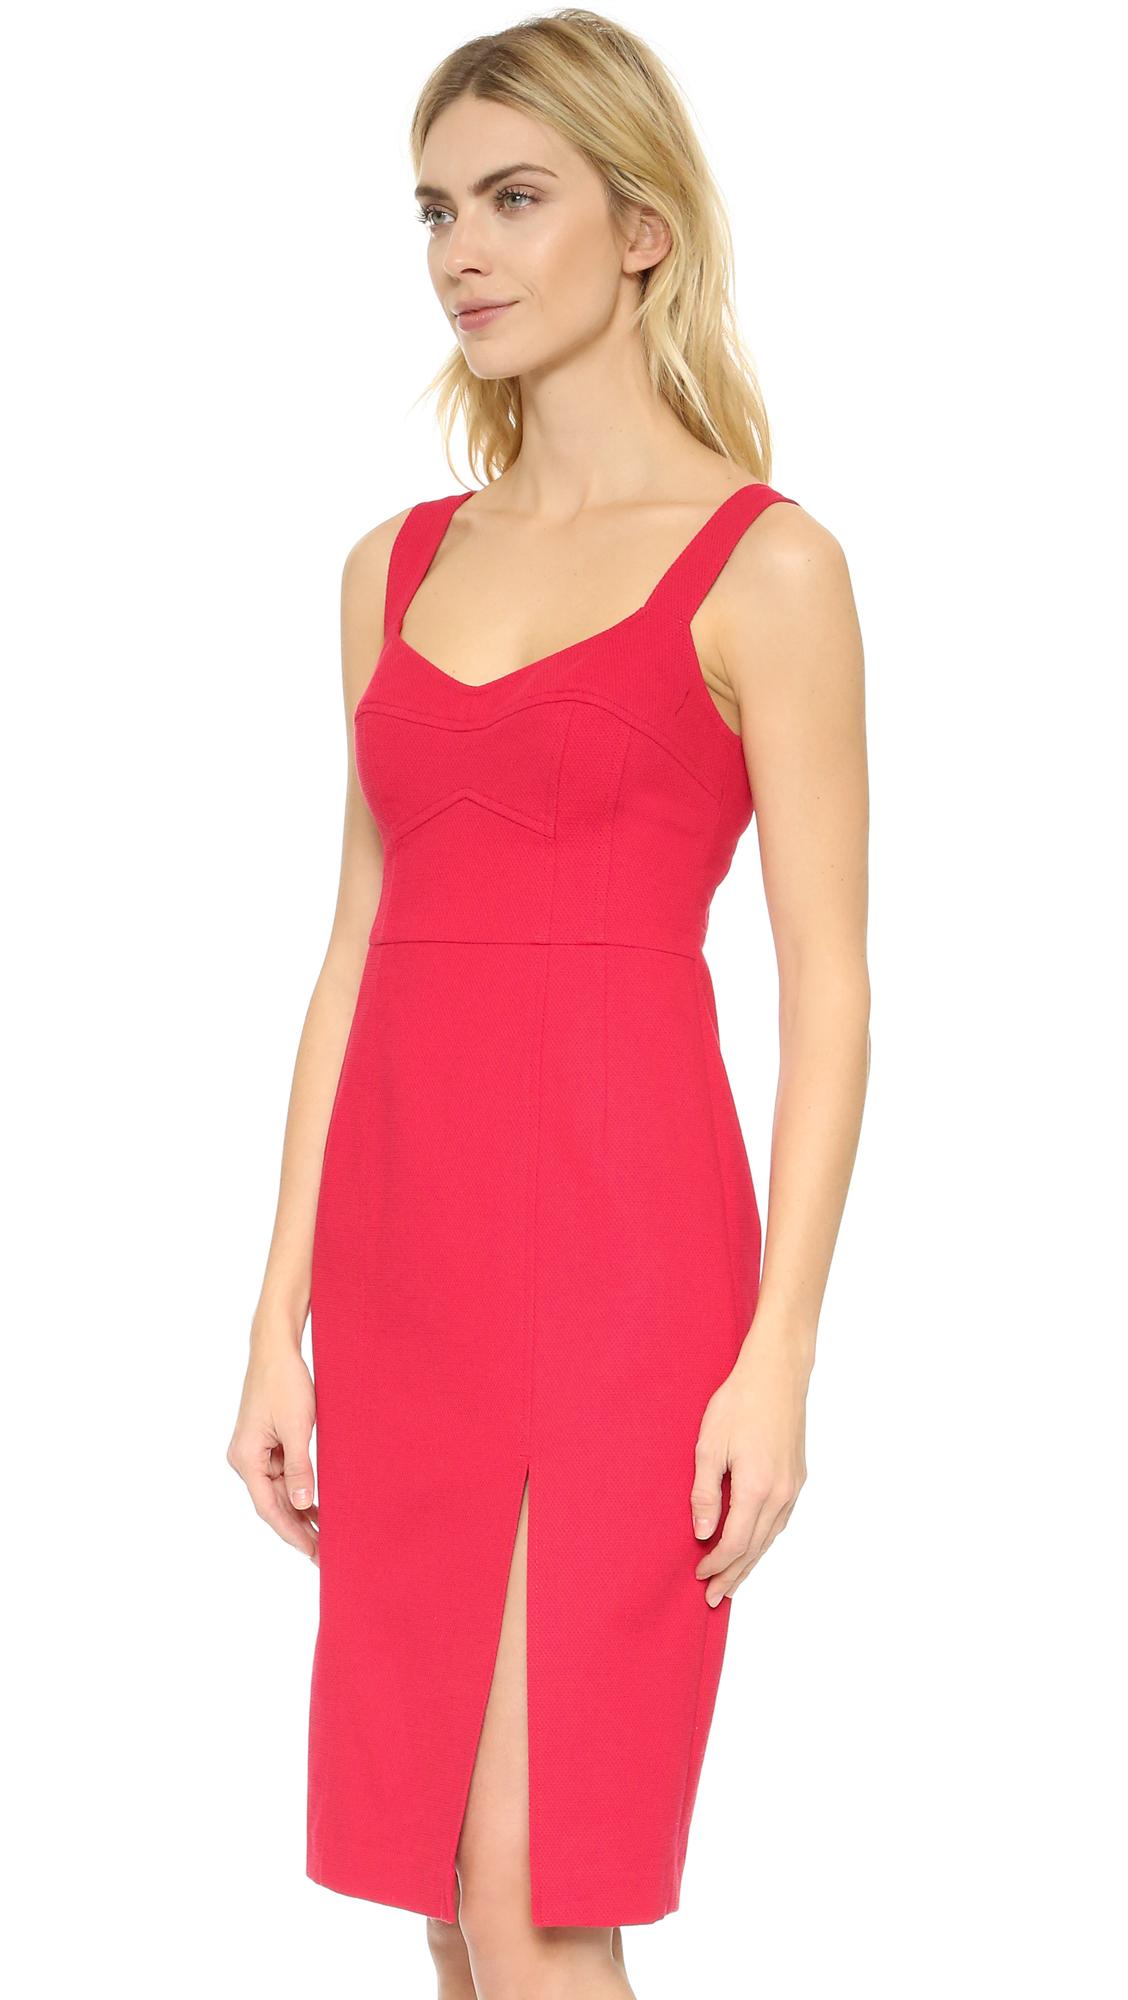 Nanette lepore Samba Sheath Dress in Red  Lyst